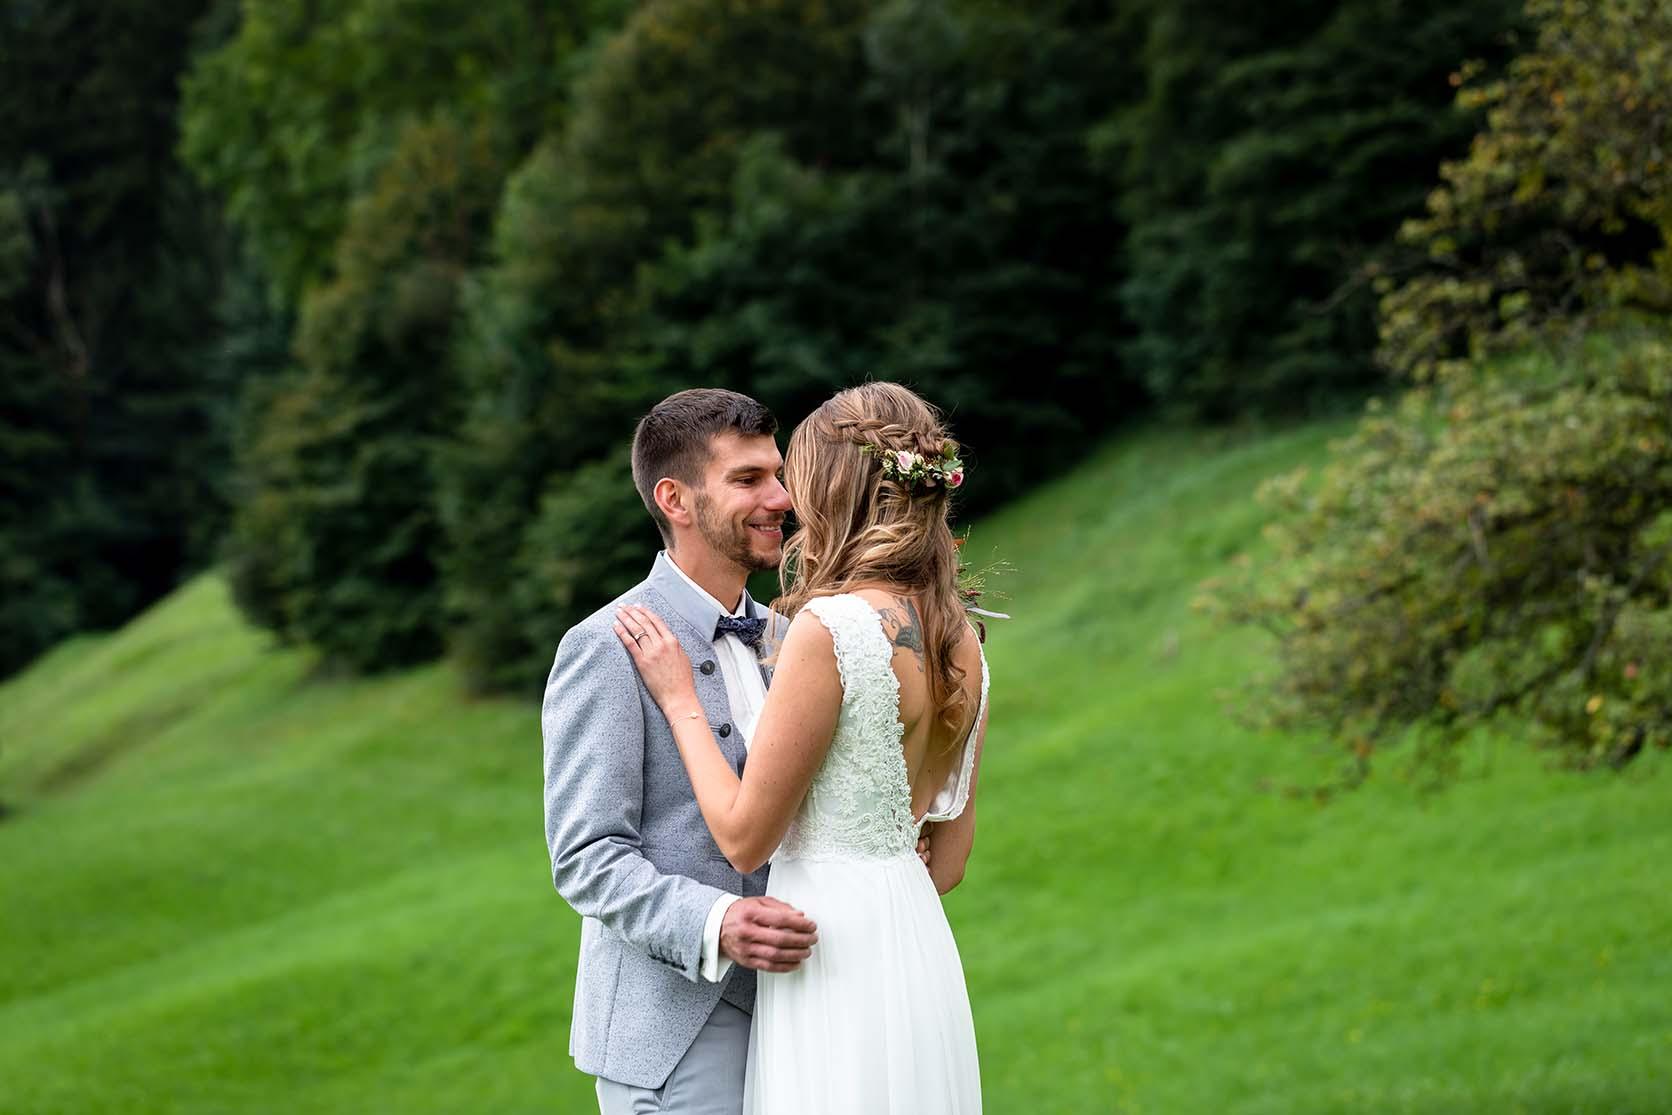 Hochzeitsfotografin Beate Oberhauser